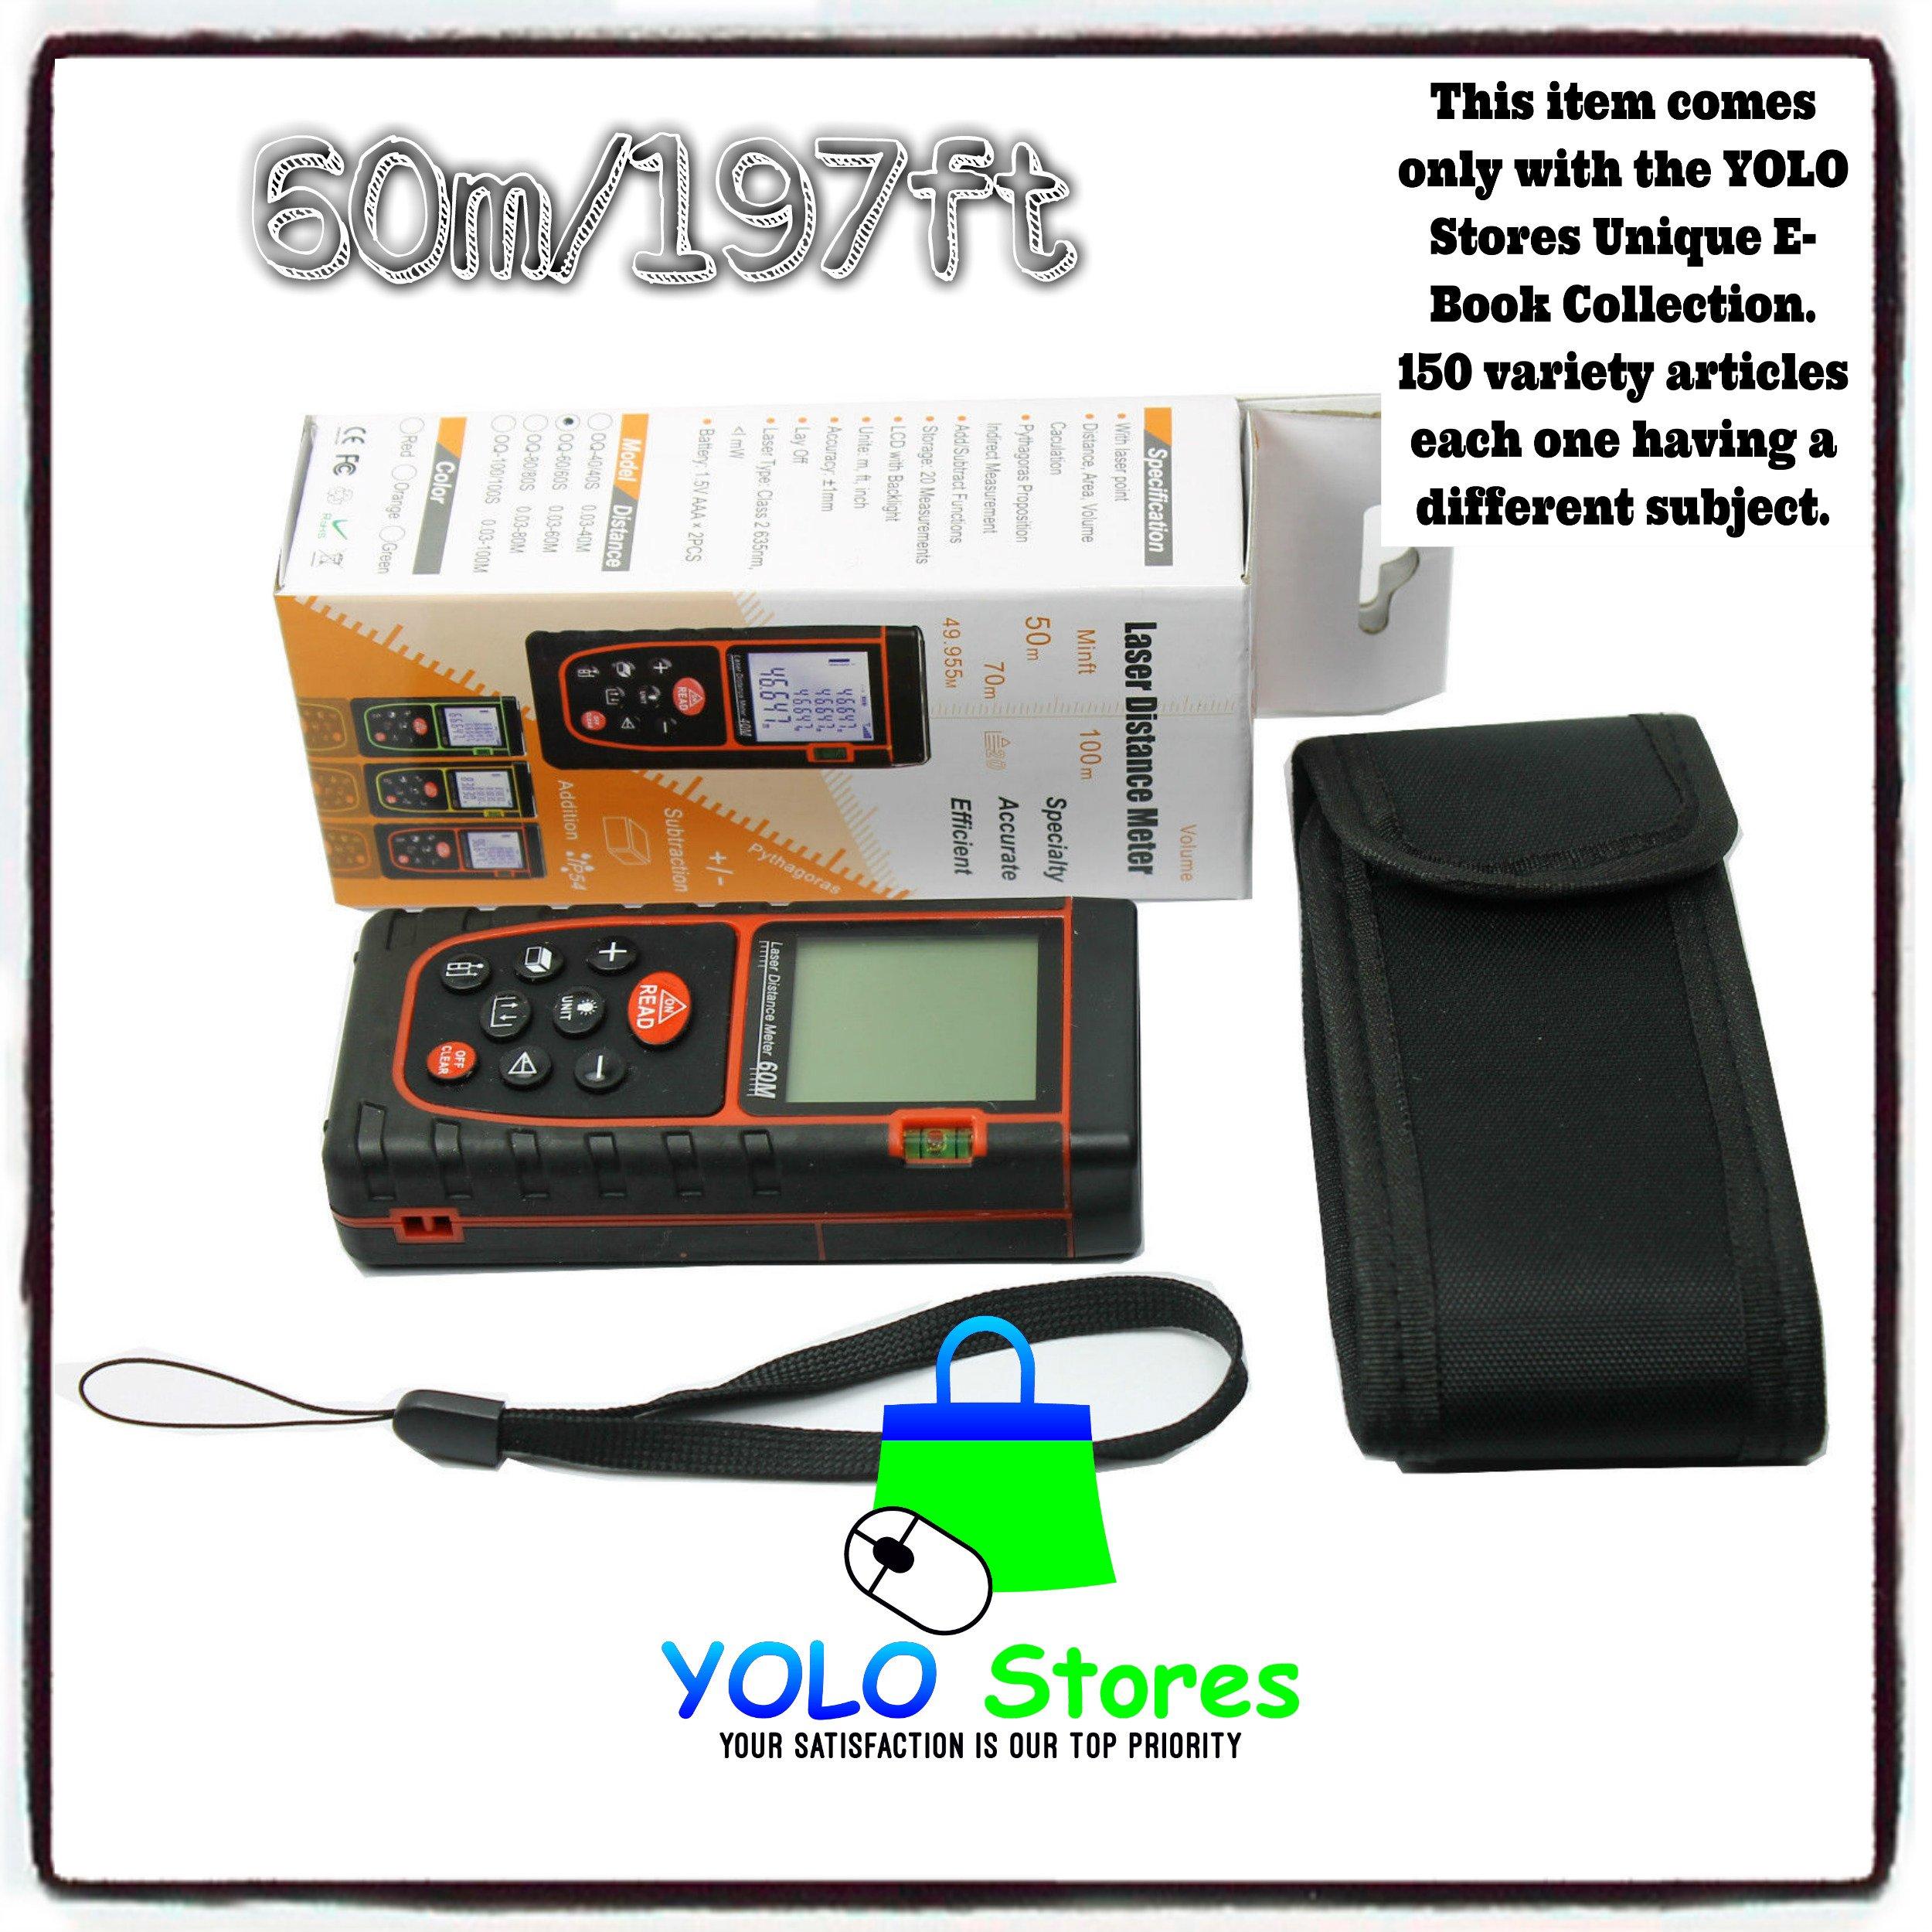 YOLO Stores Laser Rangefinder Digital Distance Finder Measure Meter Diastometer, LCD Display, 60m/197ft, Portable, e-Book Included By